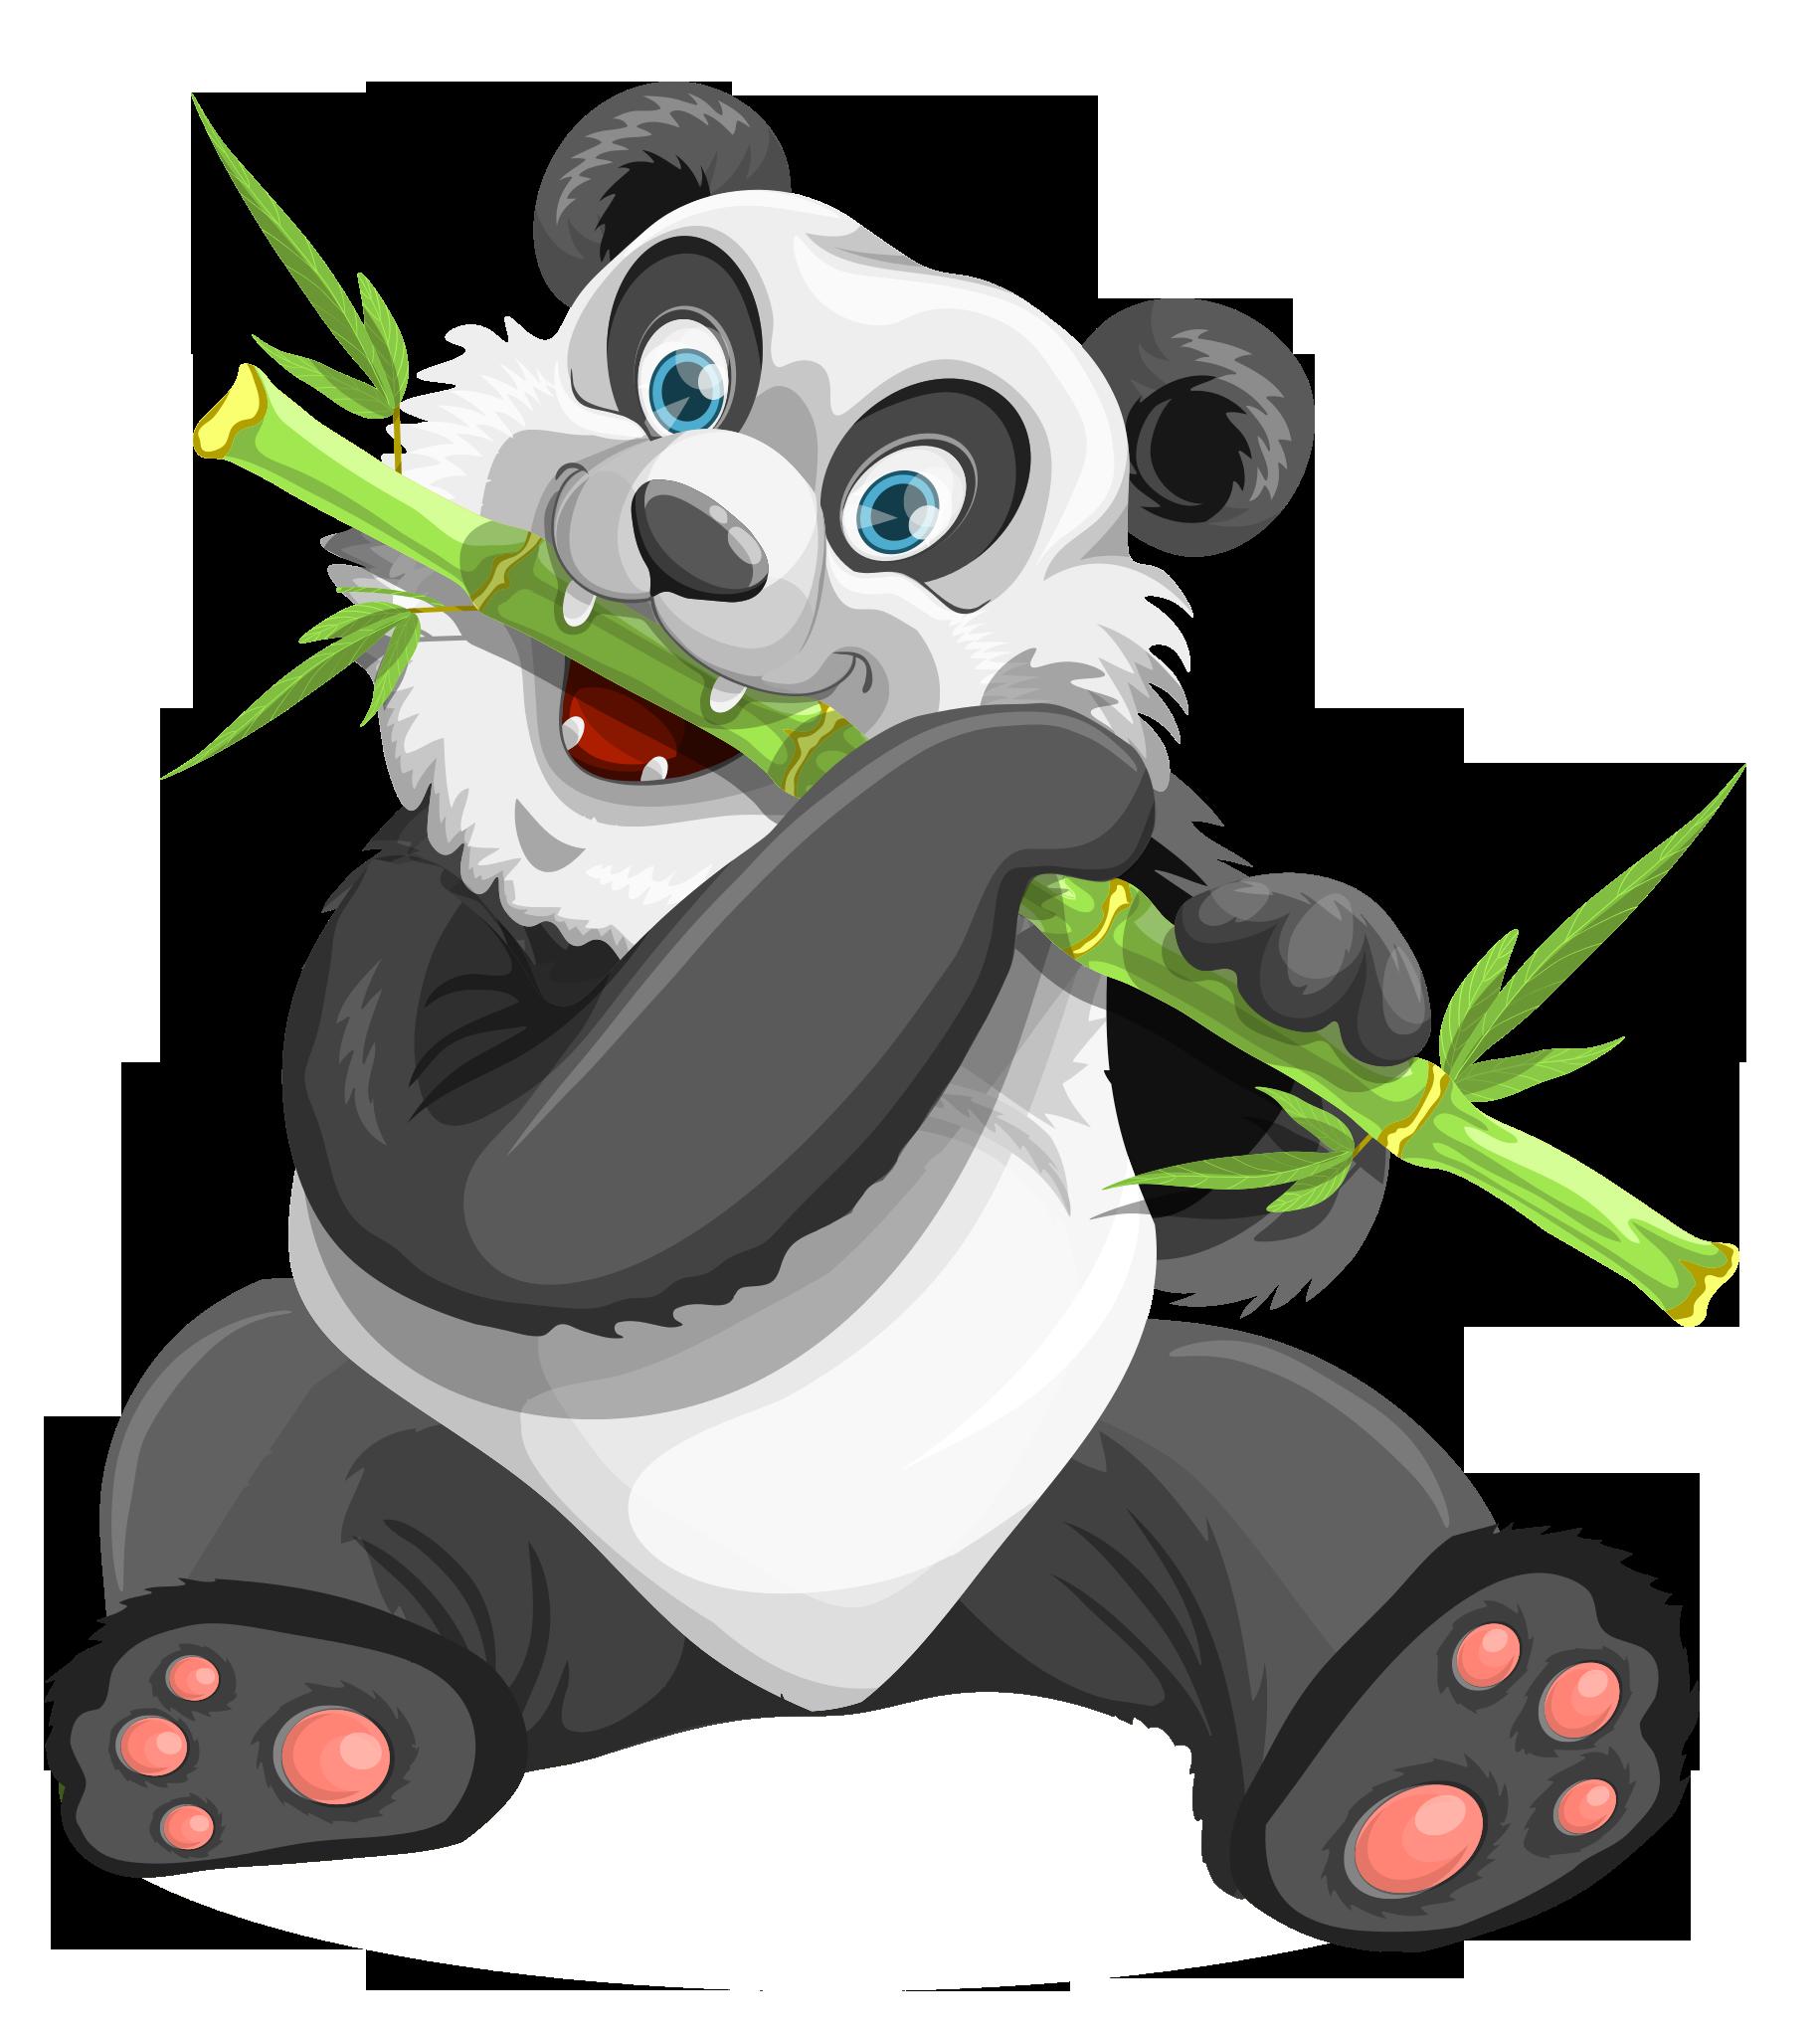 Png transparent image pngpix. Panda clipart vector